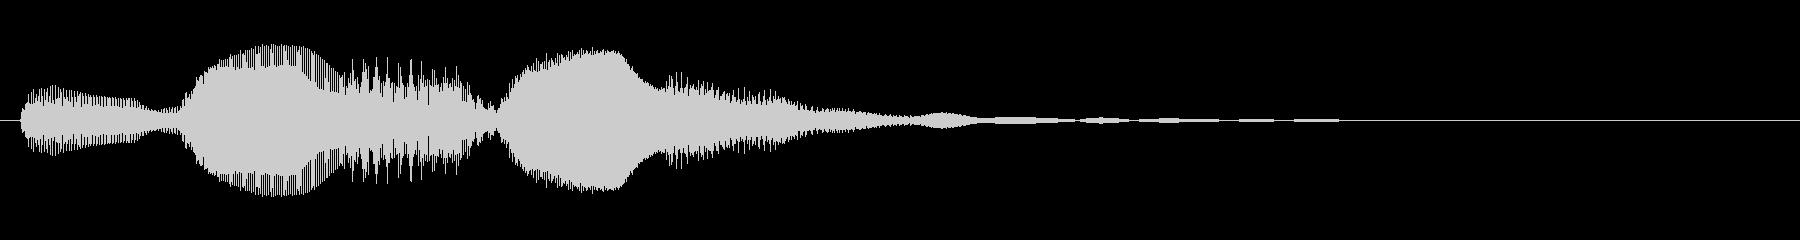 KANTアイキャッチ55電子音の未再生の波形